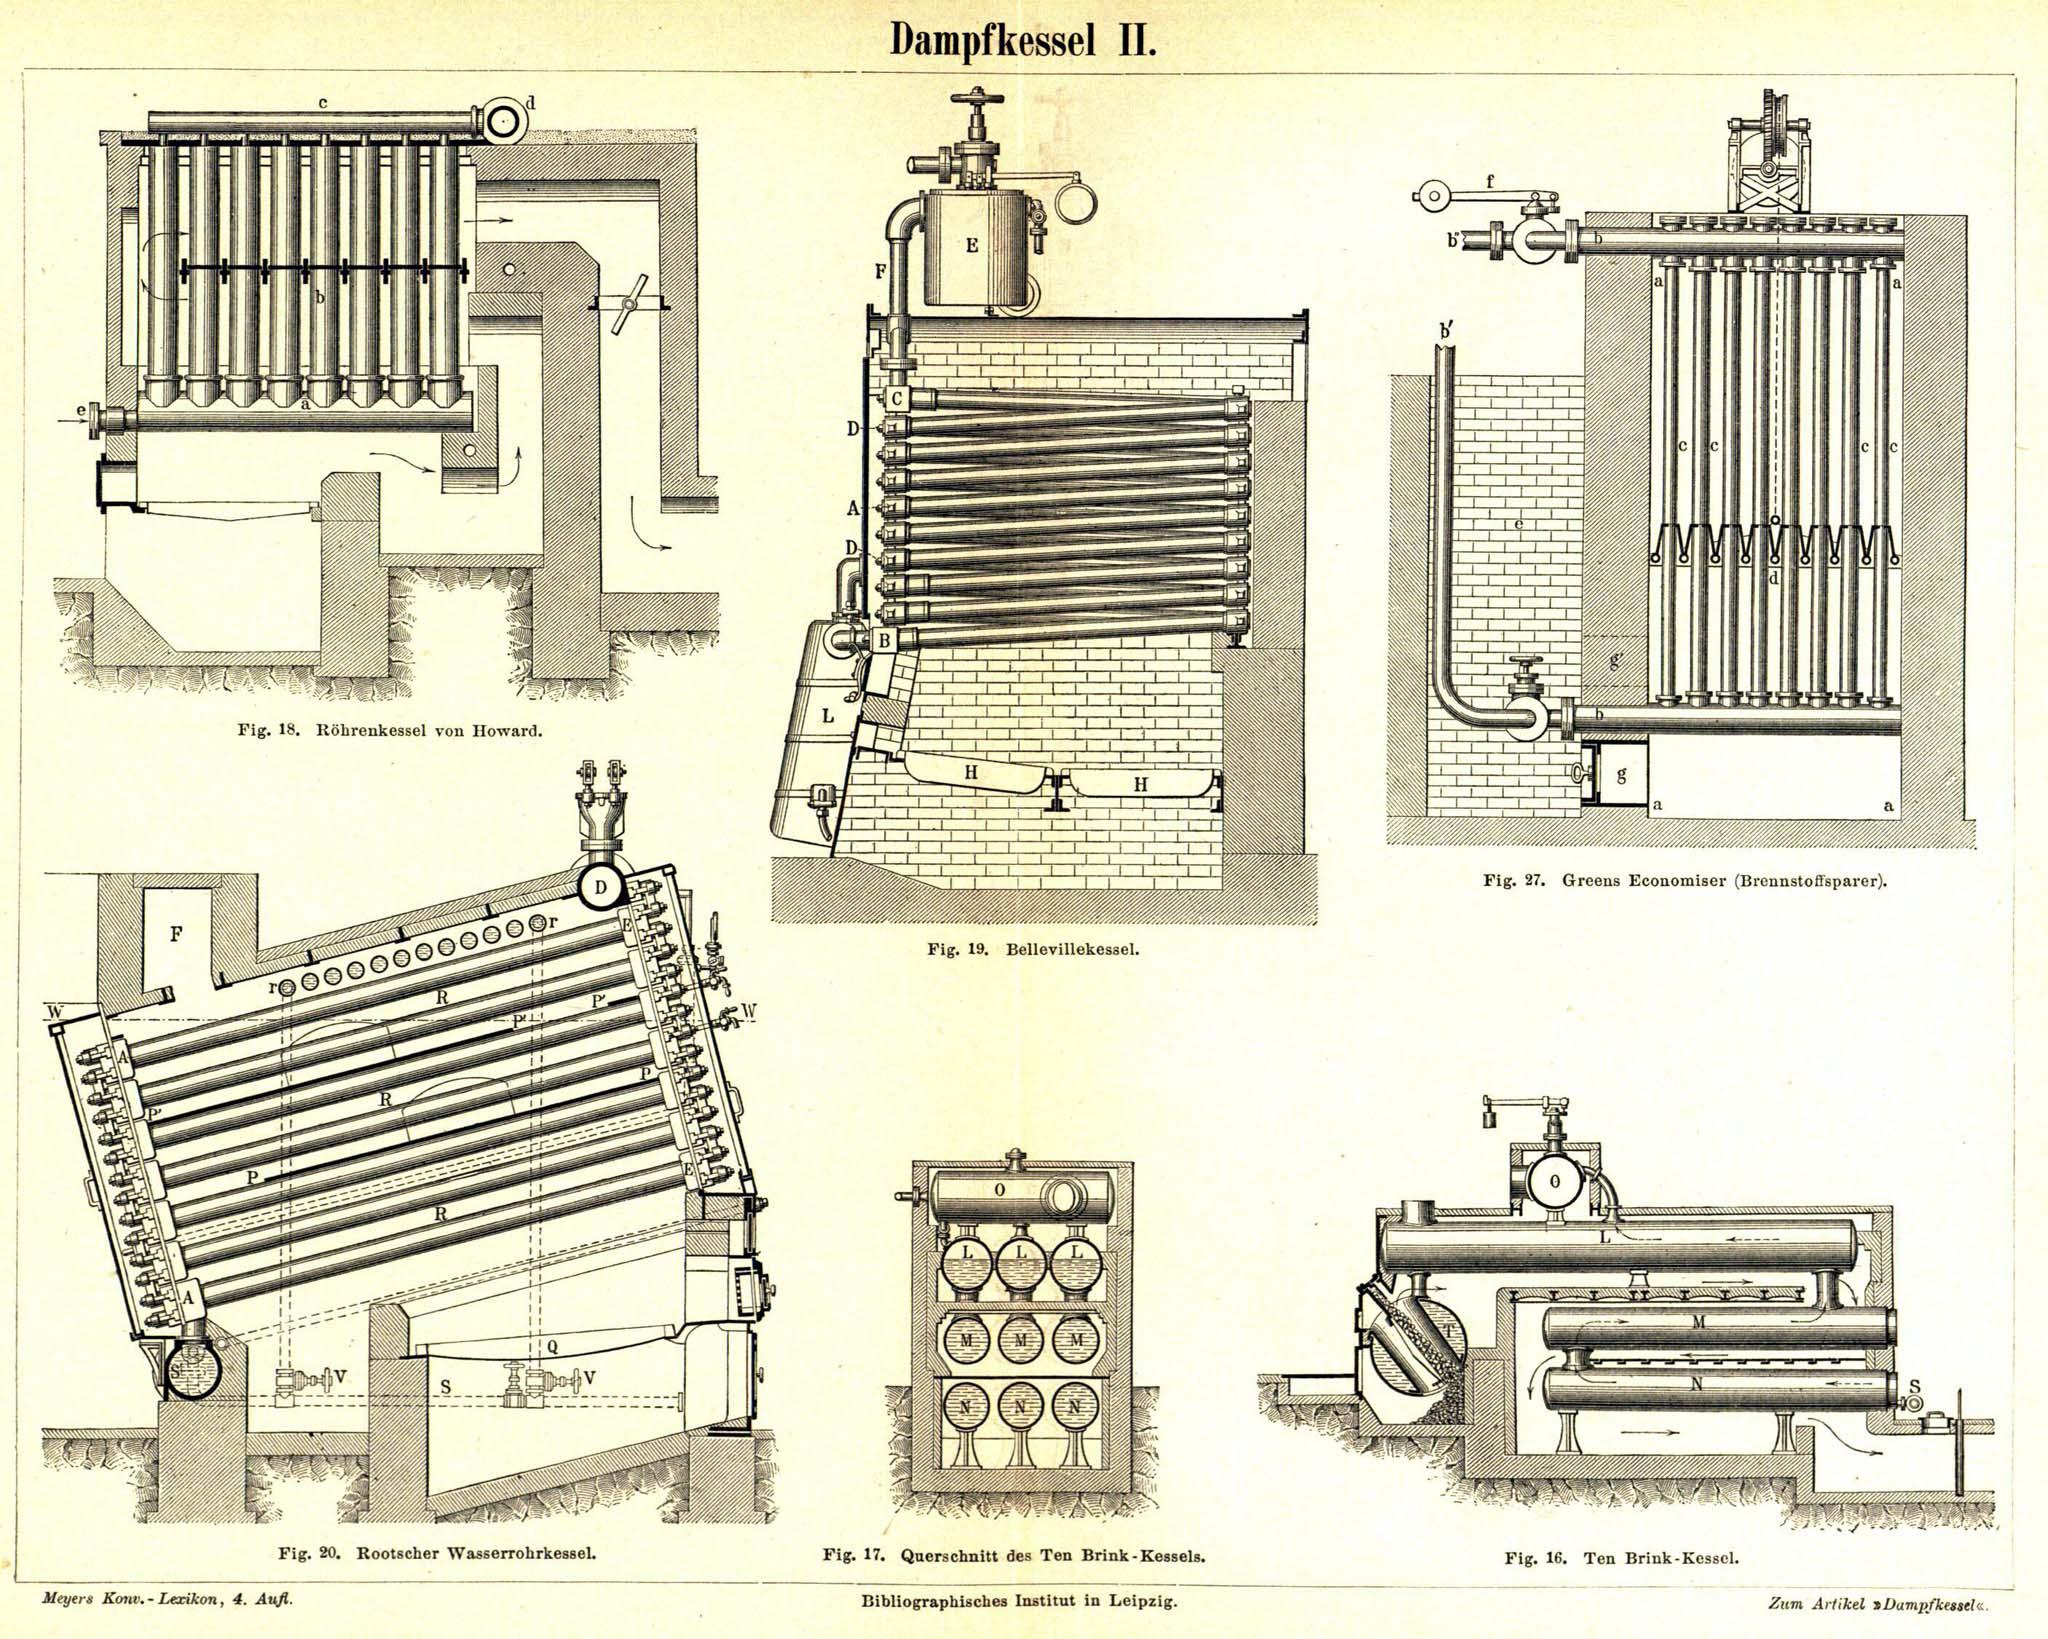 retro|bib - Seite aus Meyers Konversationslexikon: Dampfkessel II